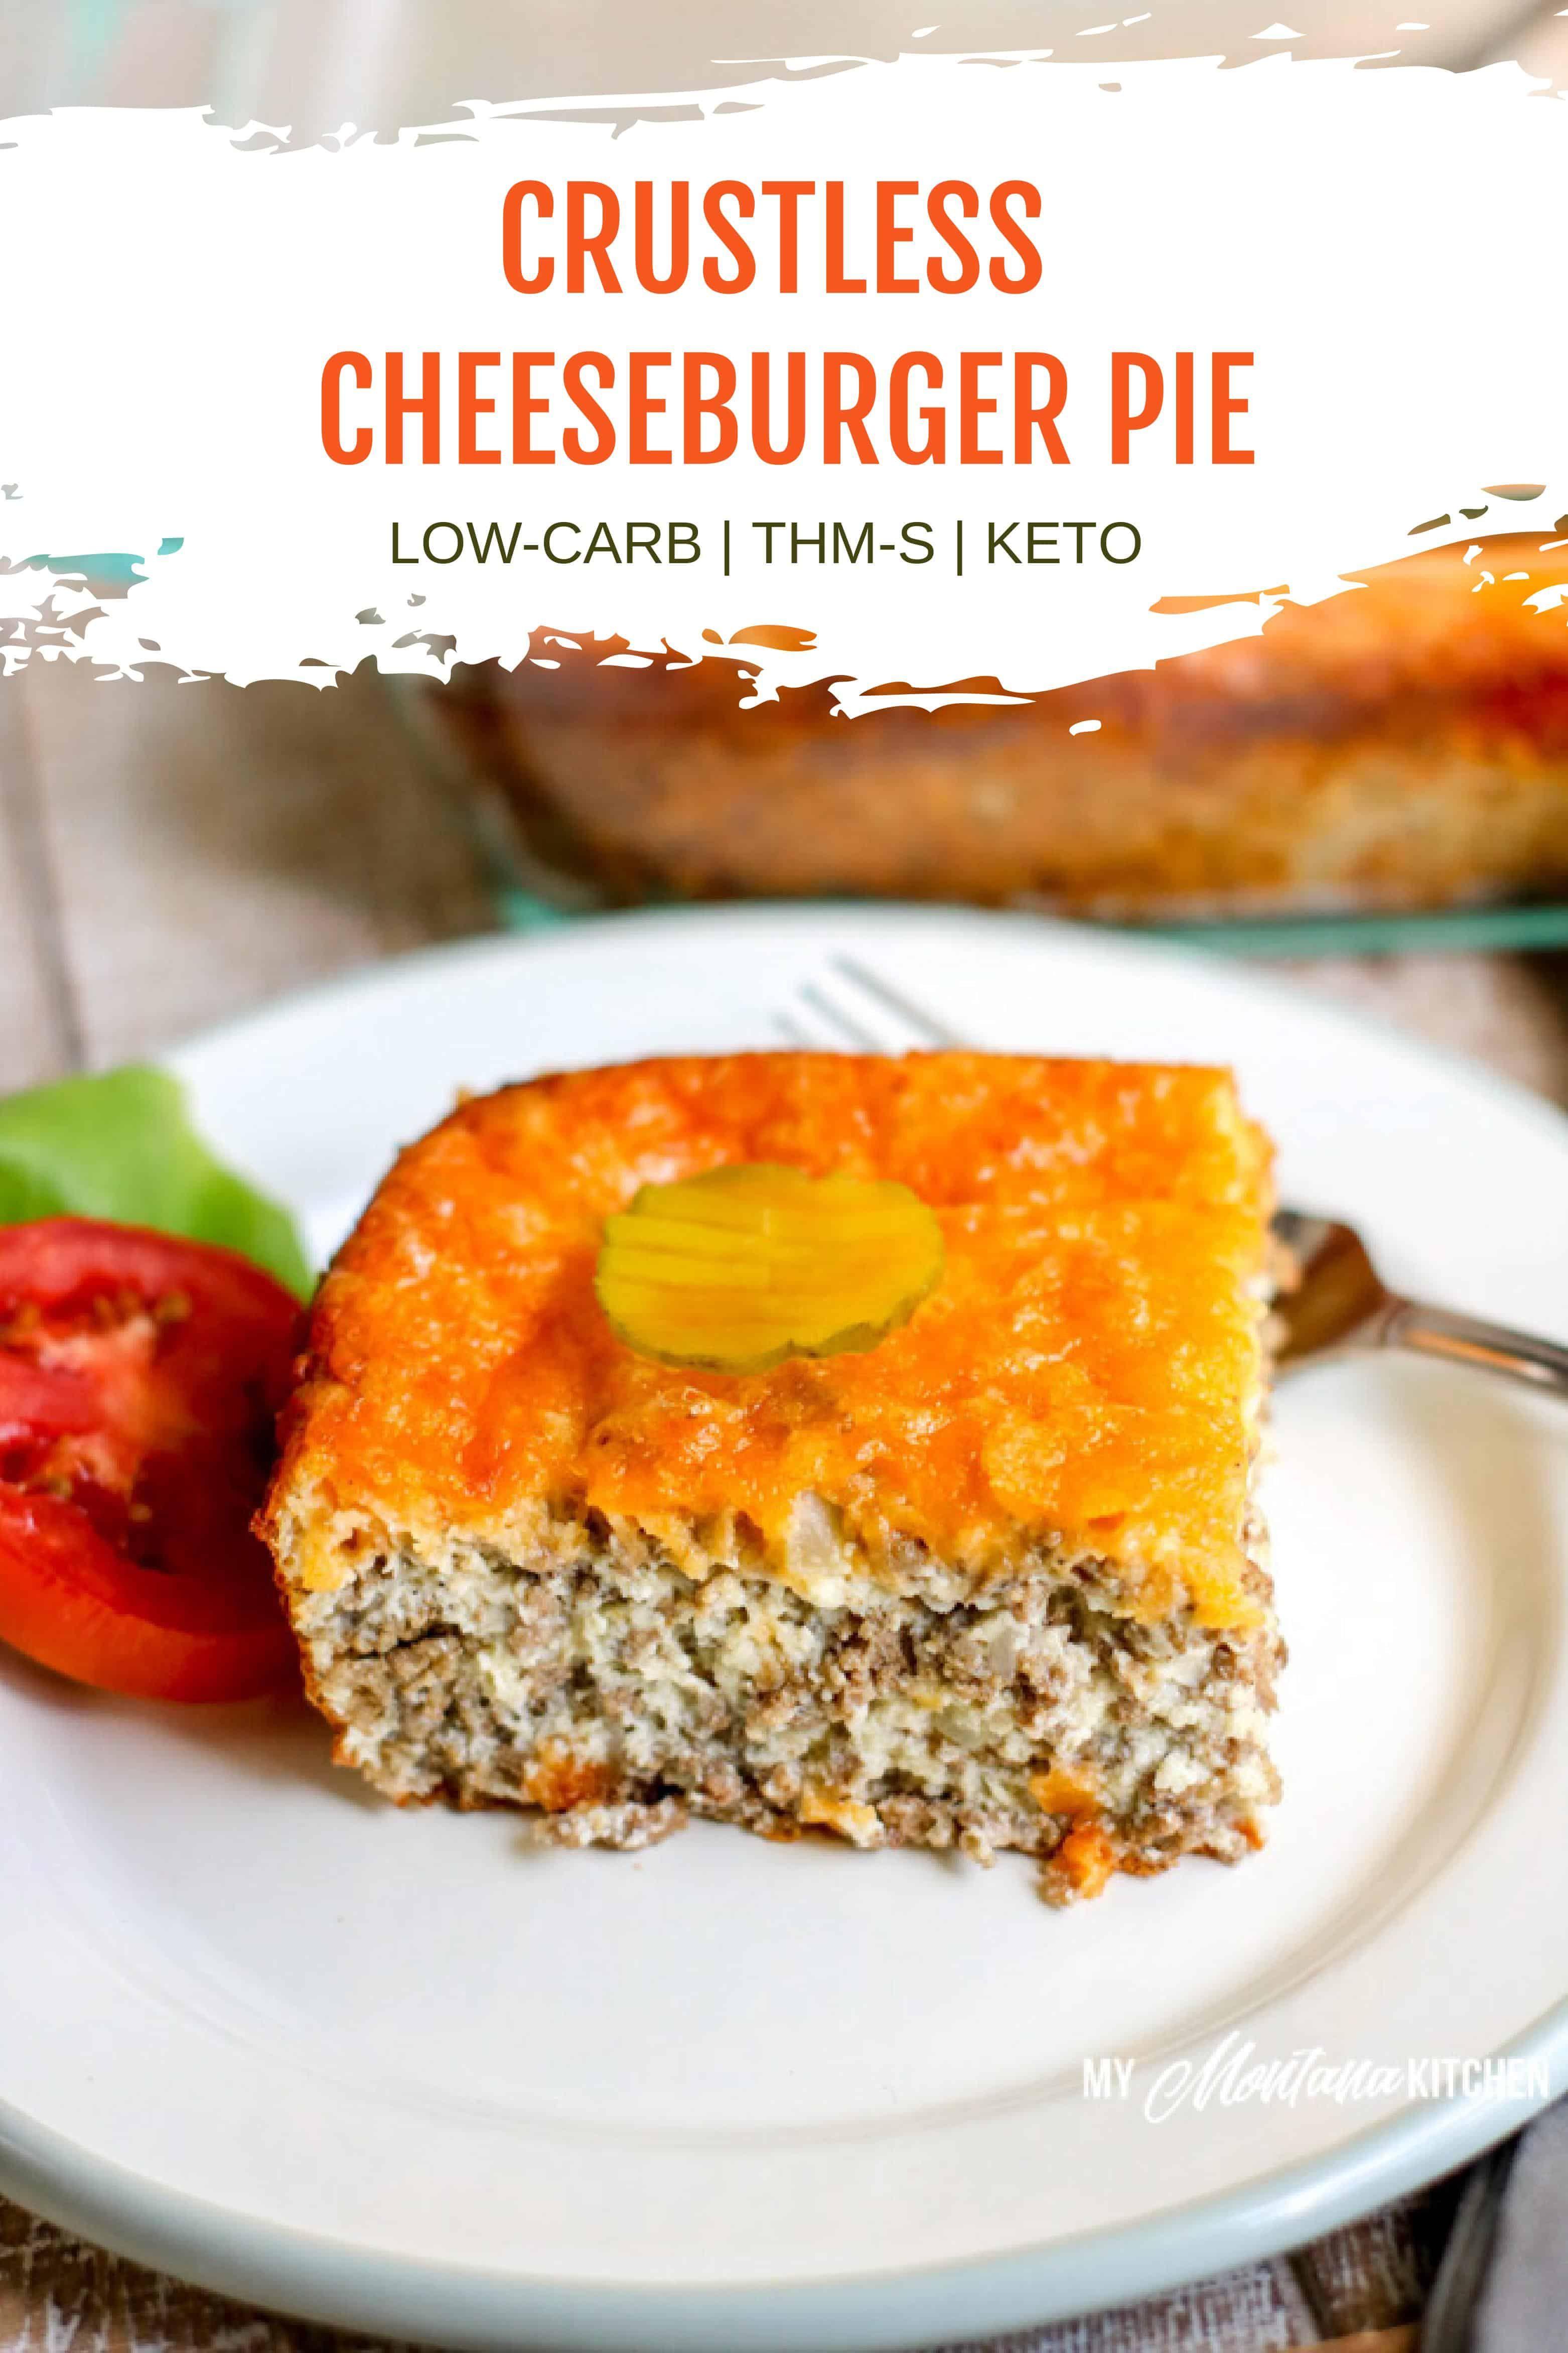 Crustless Cheeseburger Pie | Easy, Keto, Slow Cooker, THM